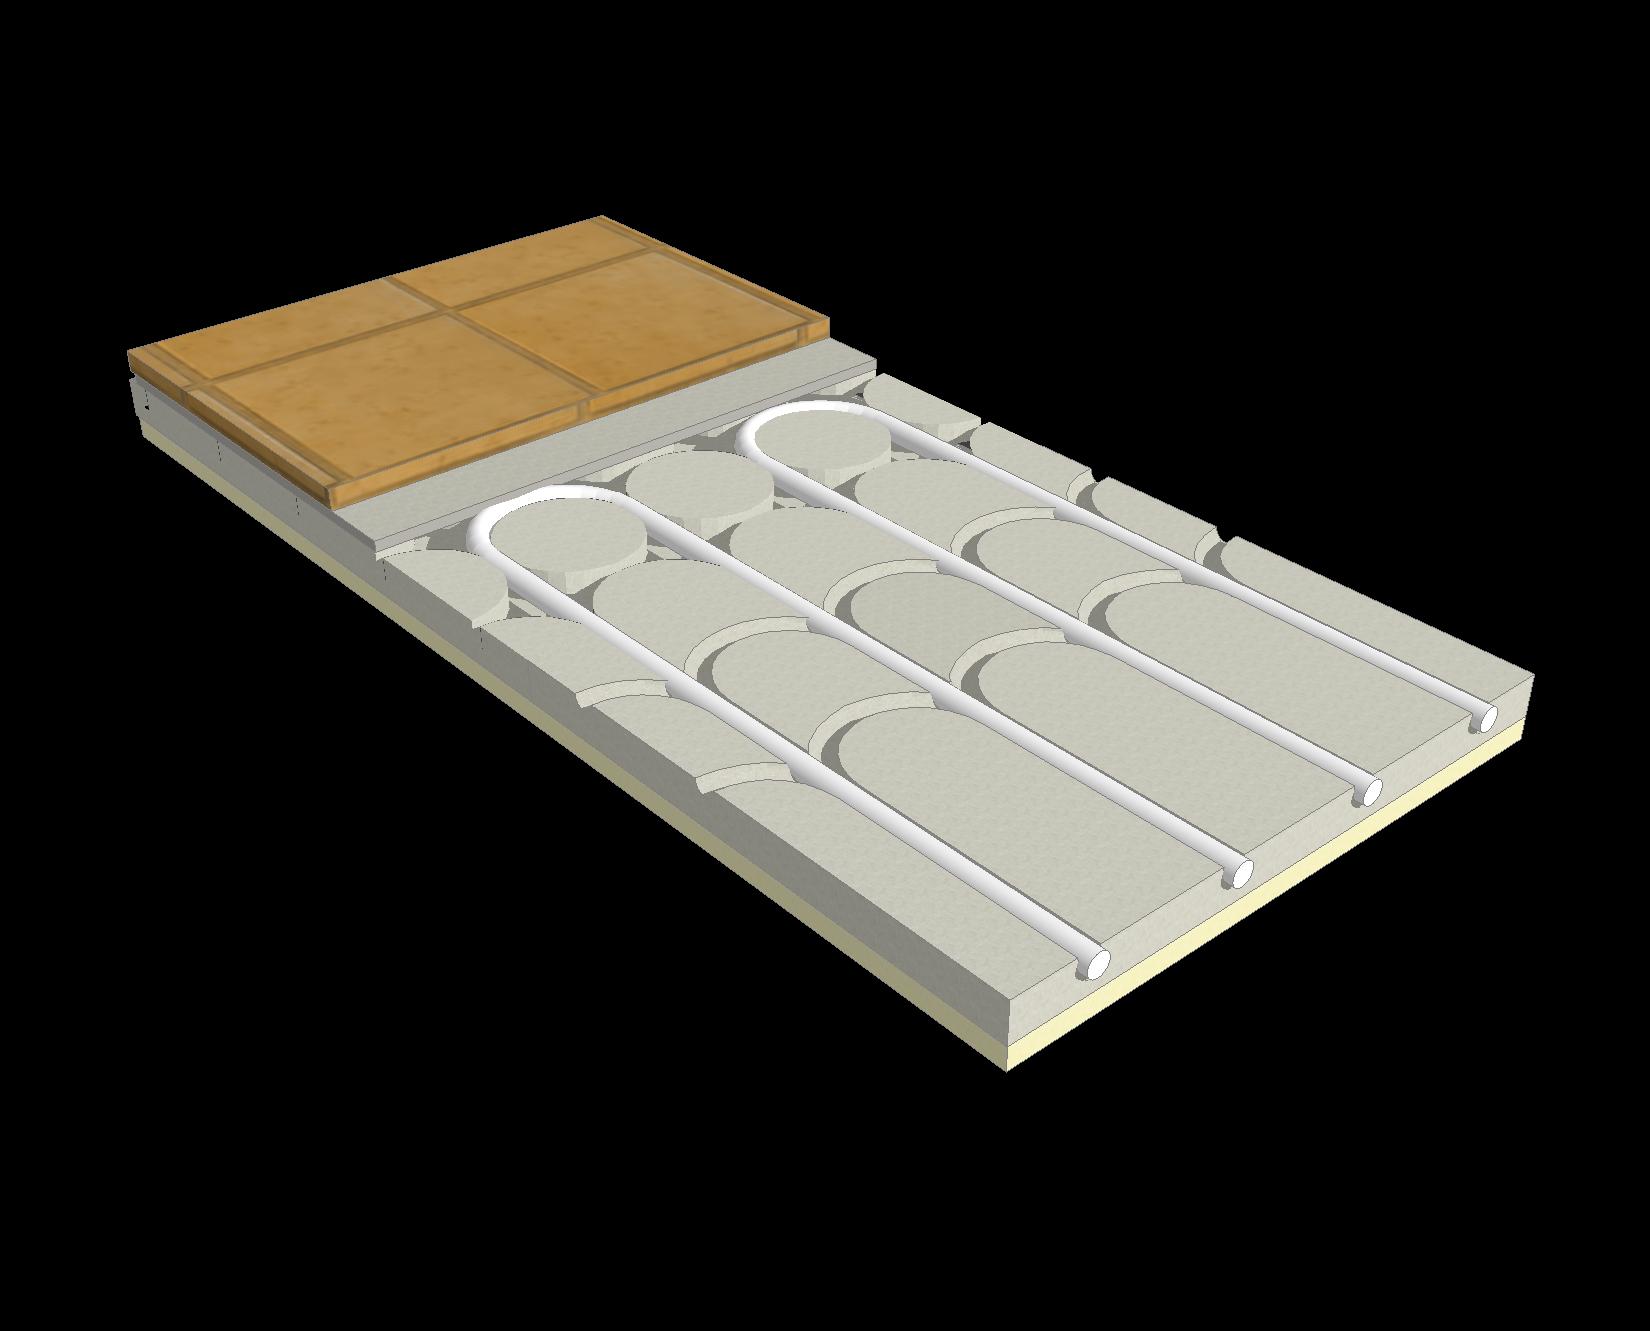 Riscaldamento A Pavimento Ribassato Spessore ecofloor slim, sistema radiante a pavimento ribassato - rci